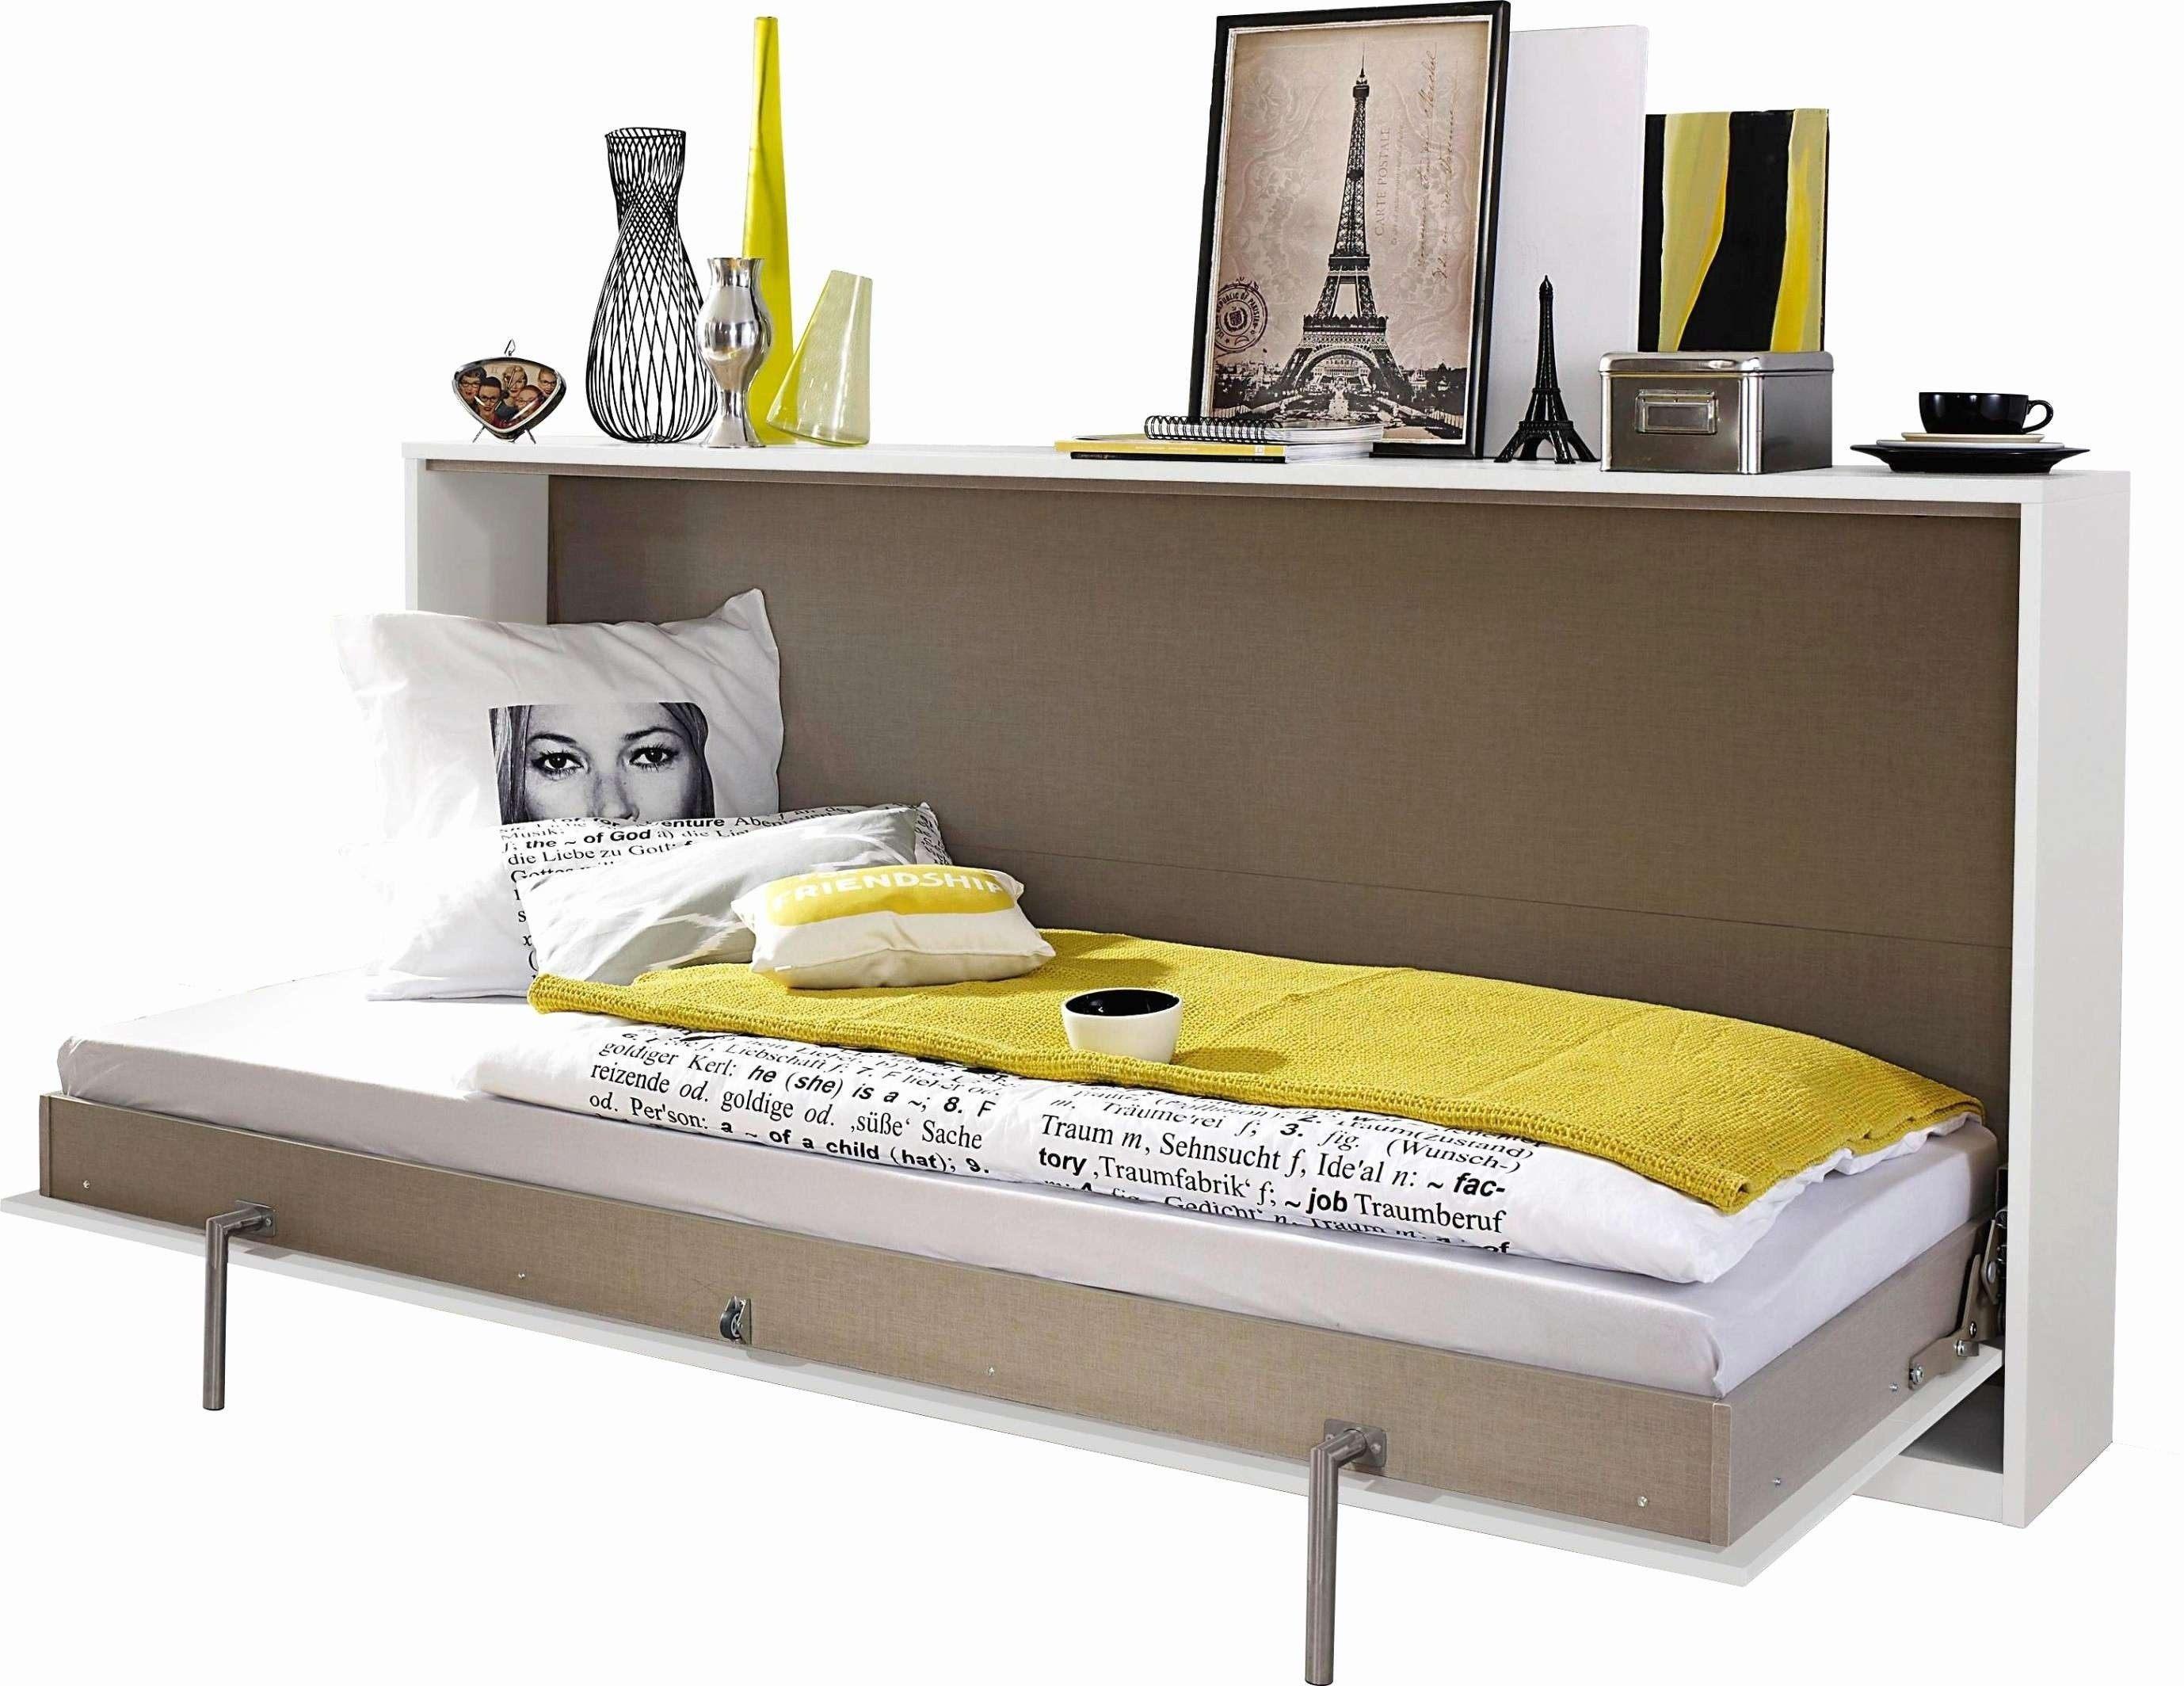 Lit En Bois Joli Lit Design 160—200 Prodigous Image Tate De Lit Bois Ikea Lit 160—200